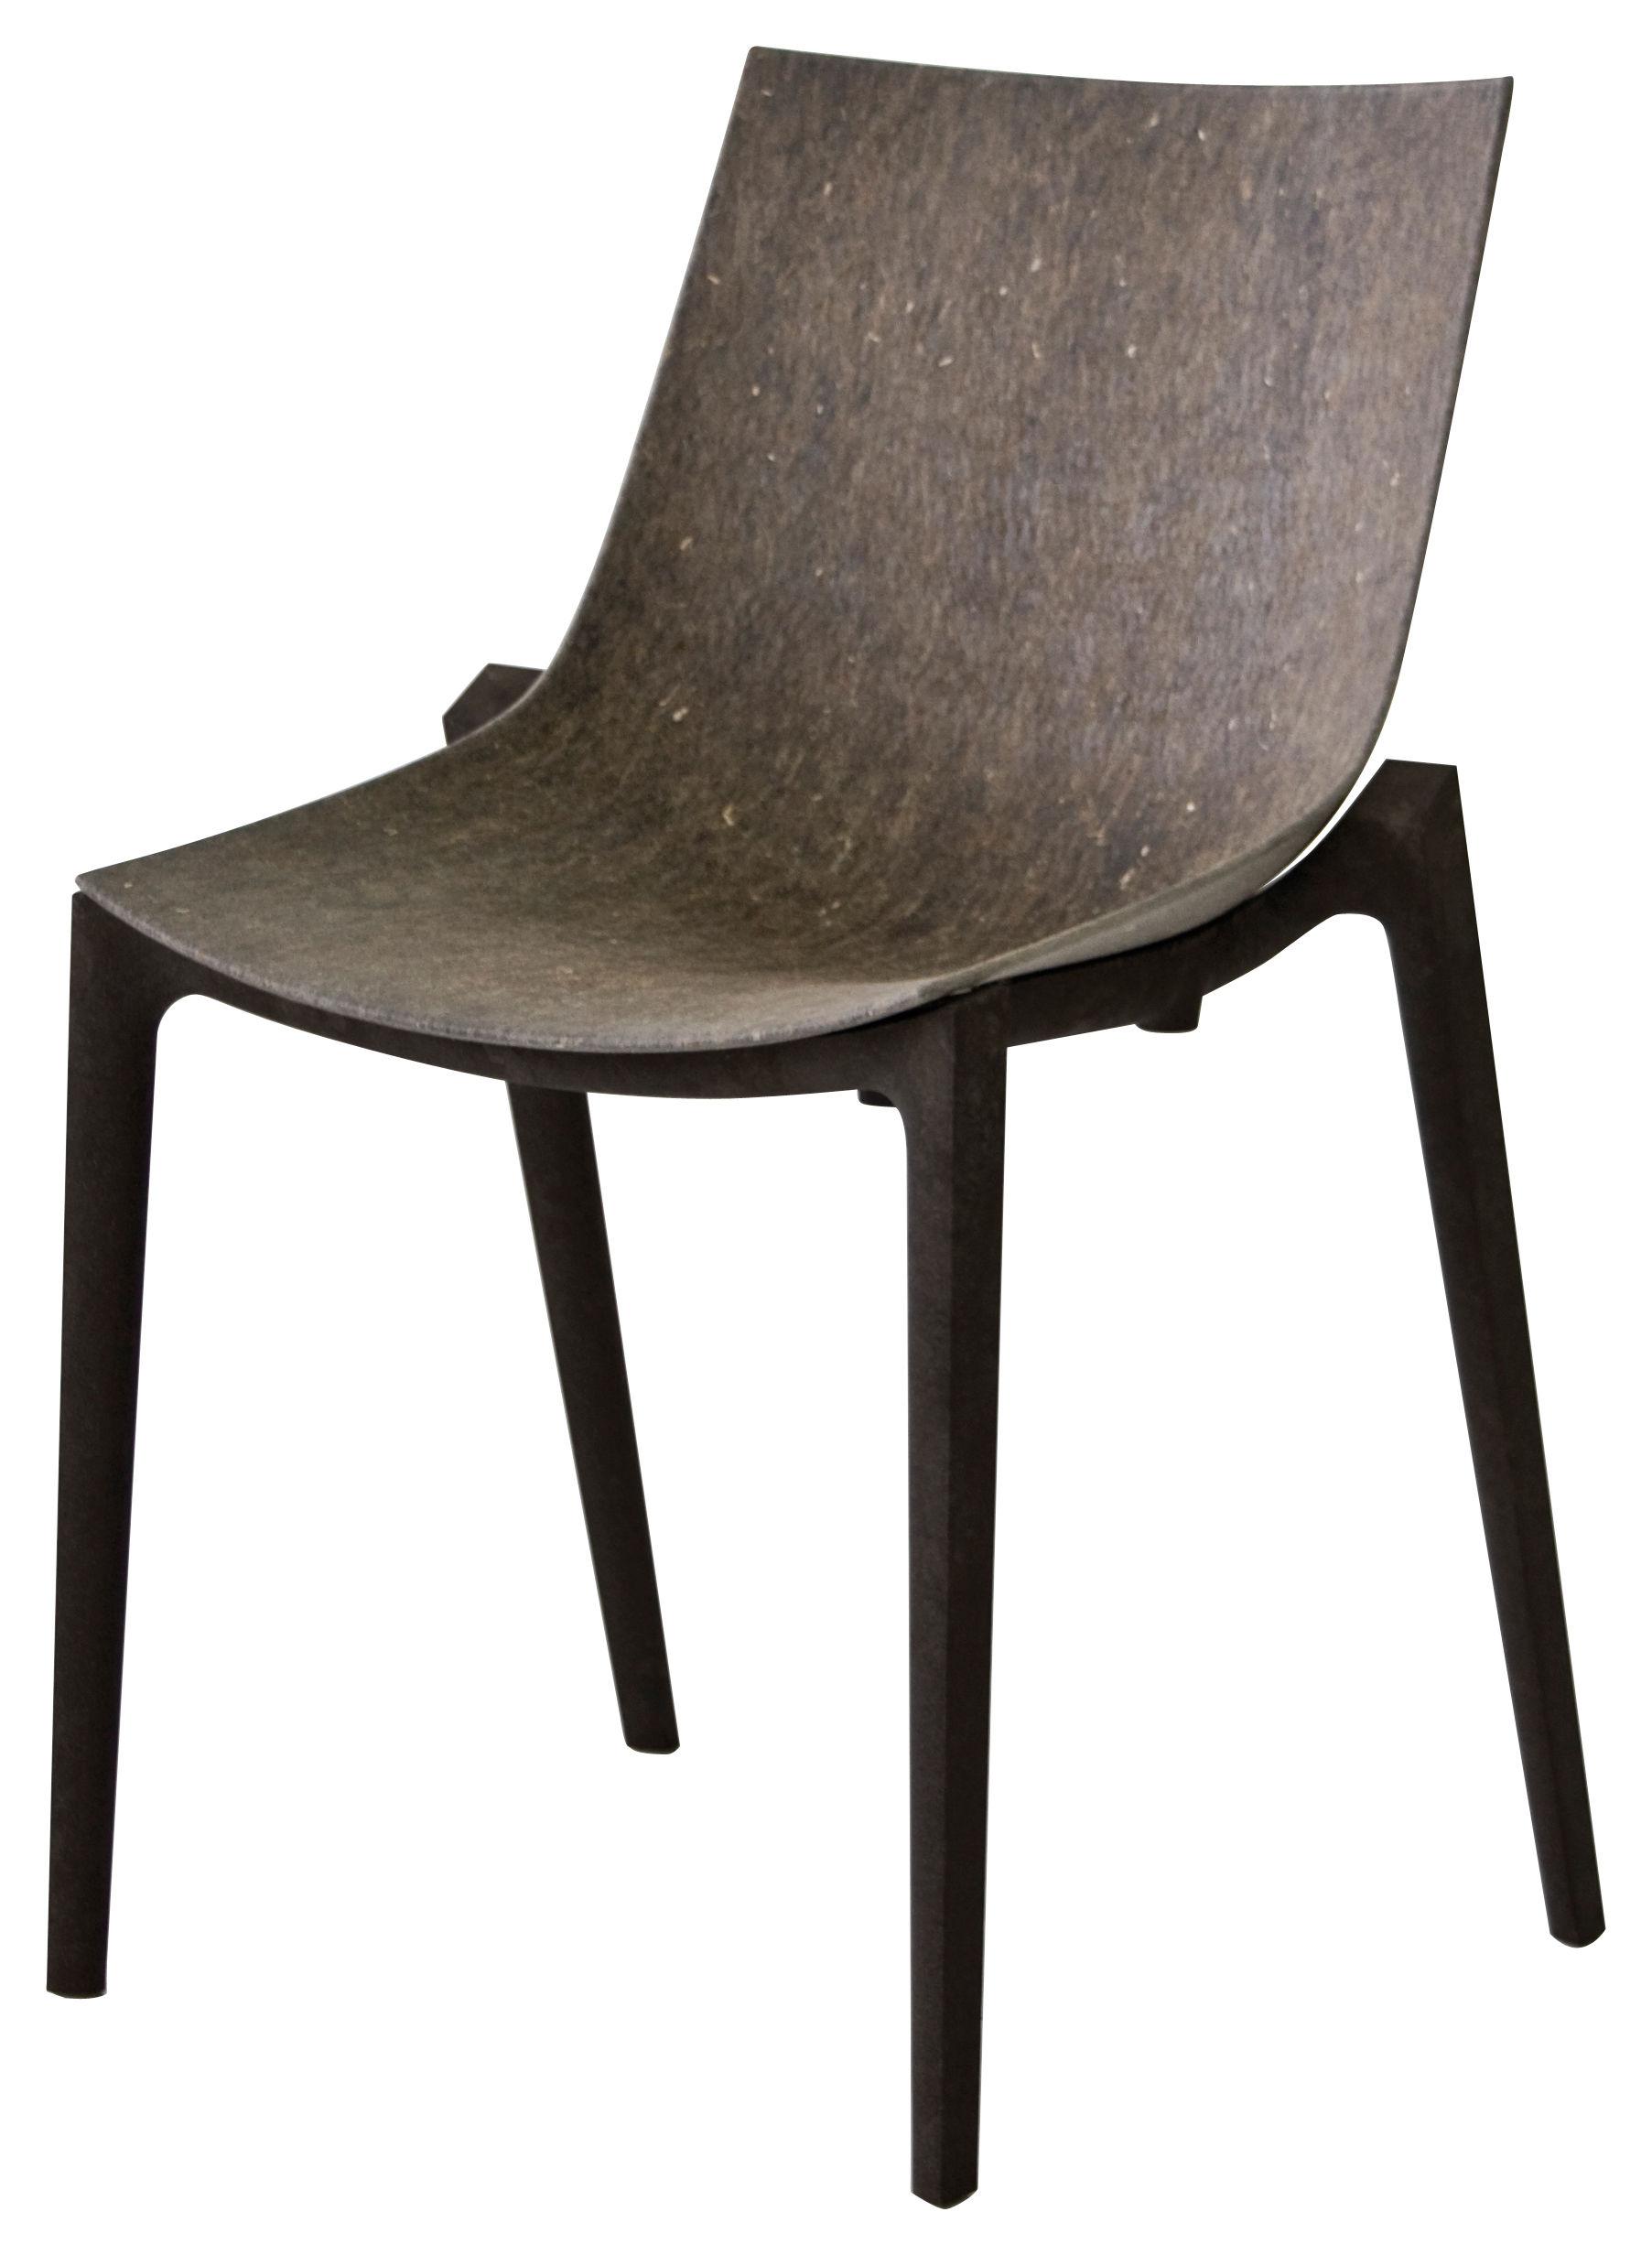 Furniture - Zartan Eco Stacking chair - Hemp fiber by Magis - Grey seat / Dark grey legs - Hemp fibre, Recycled polypropylene